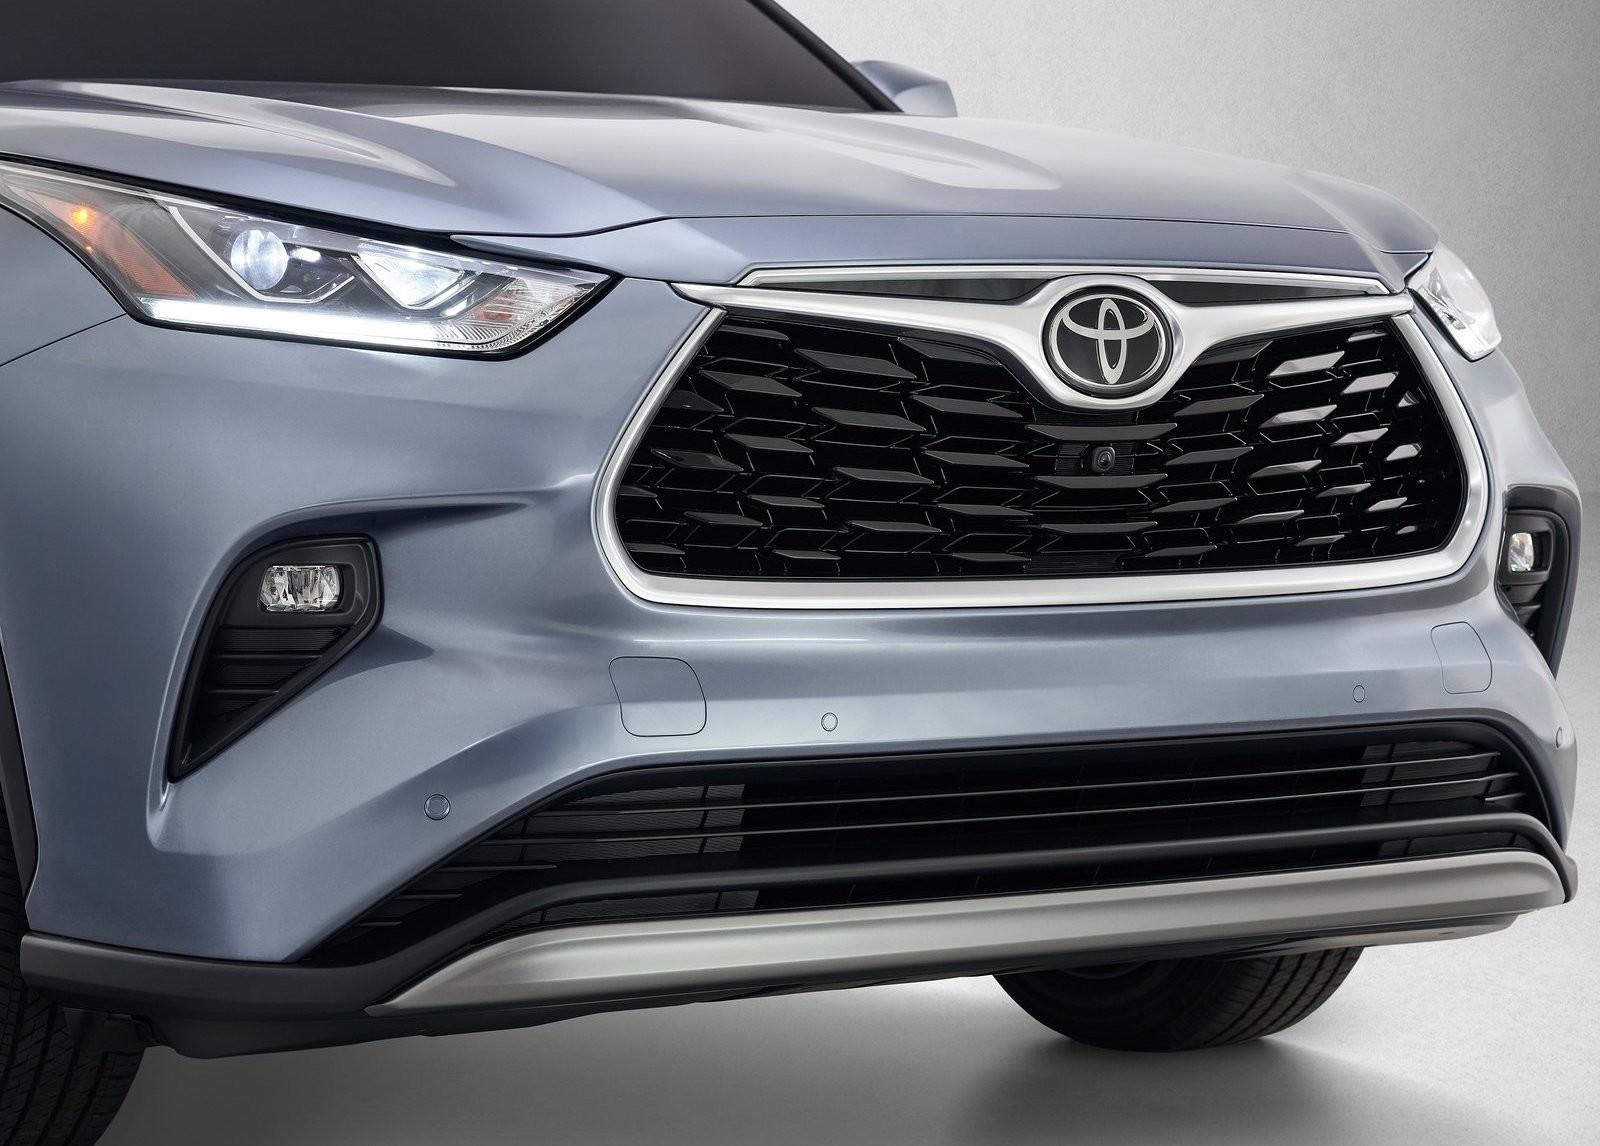 Foto de Toyota Highlander 2020 (13/13)